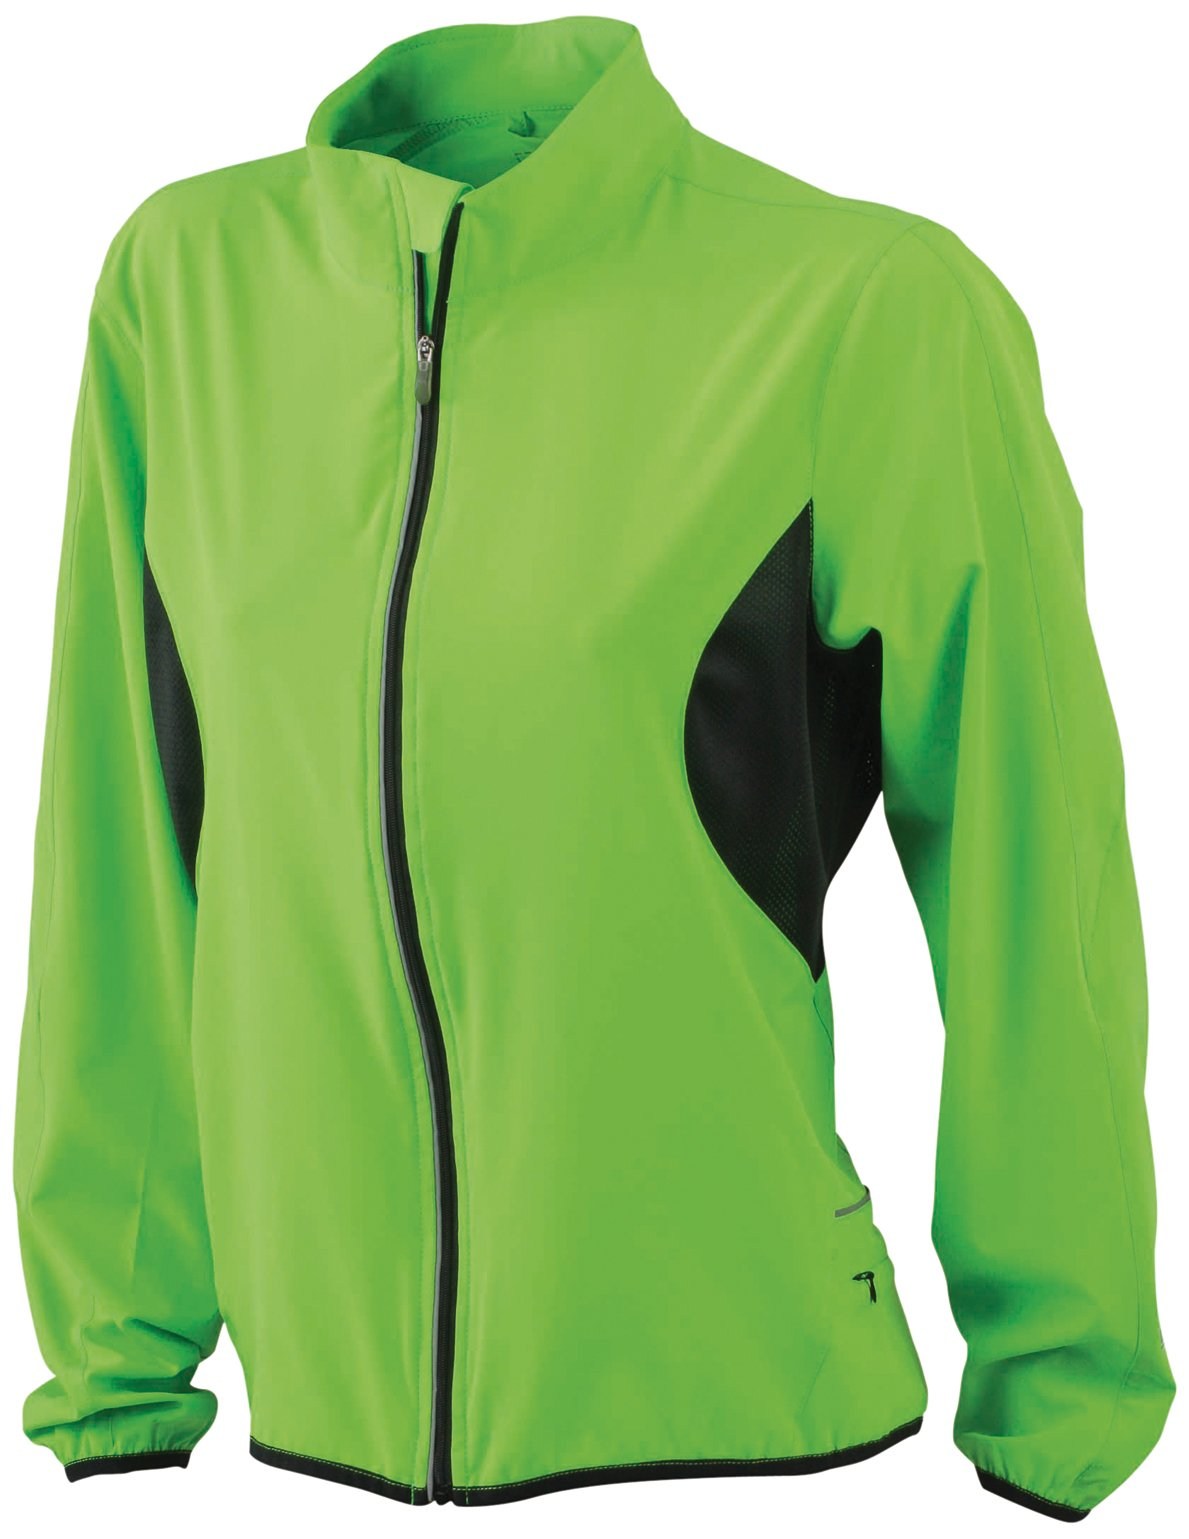 James & Nicholson Women's Running Jacket, Fluogreen/Black, Medium by James & Nicholson (Image #1)